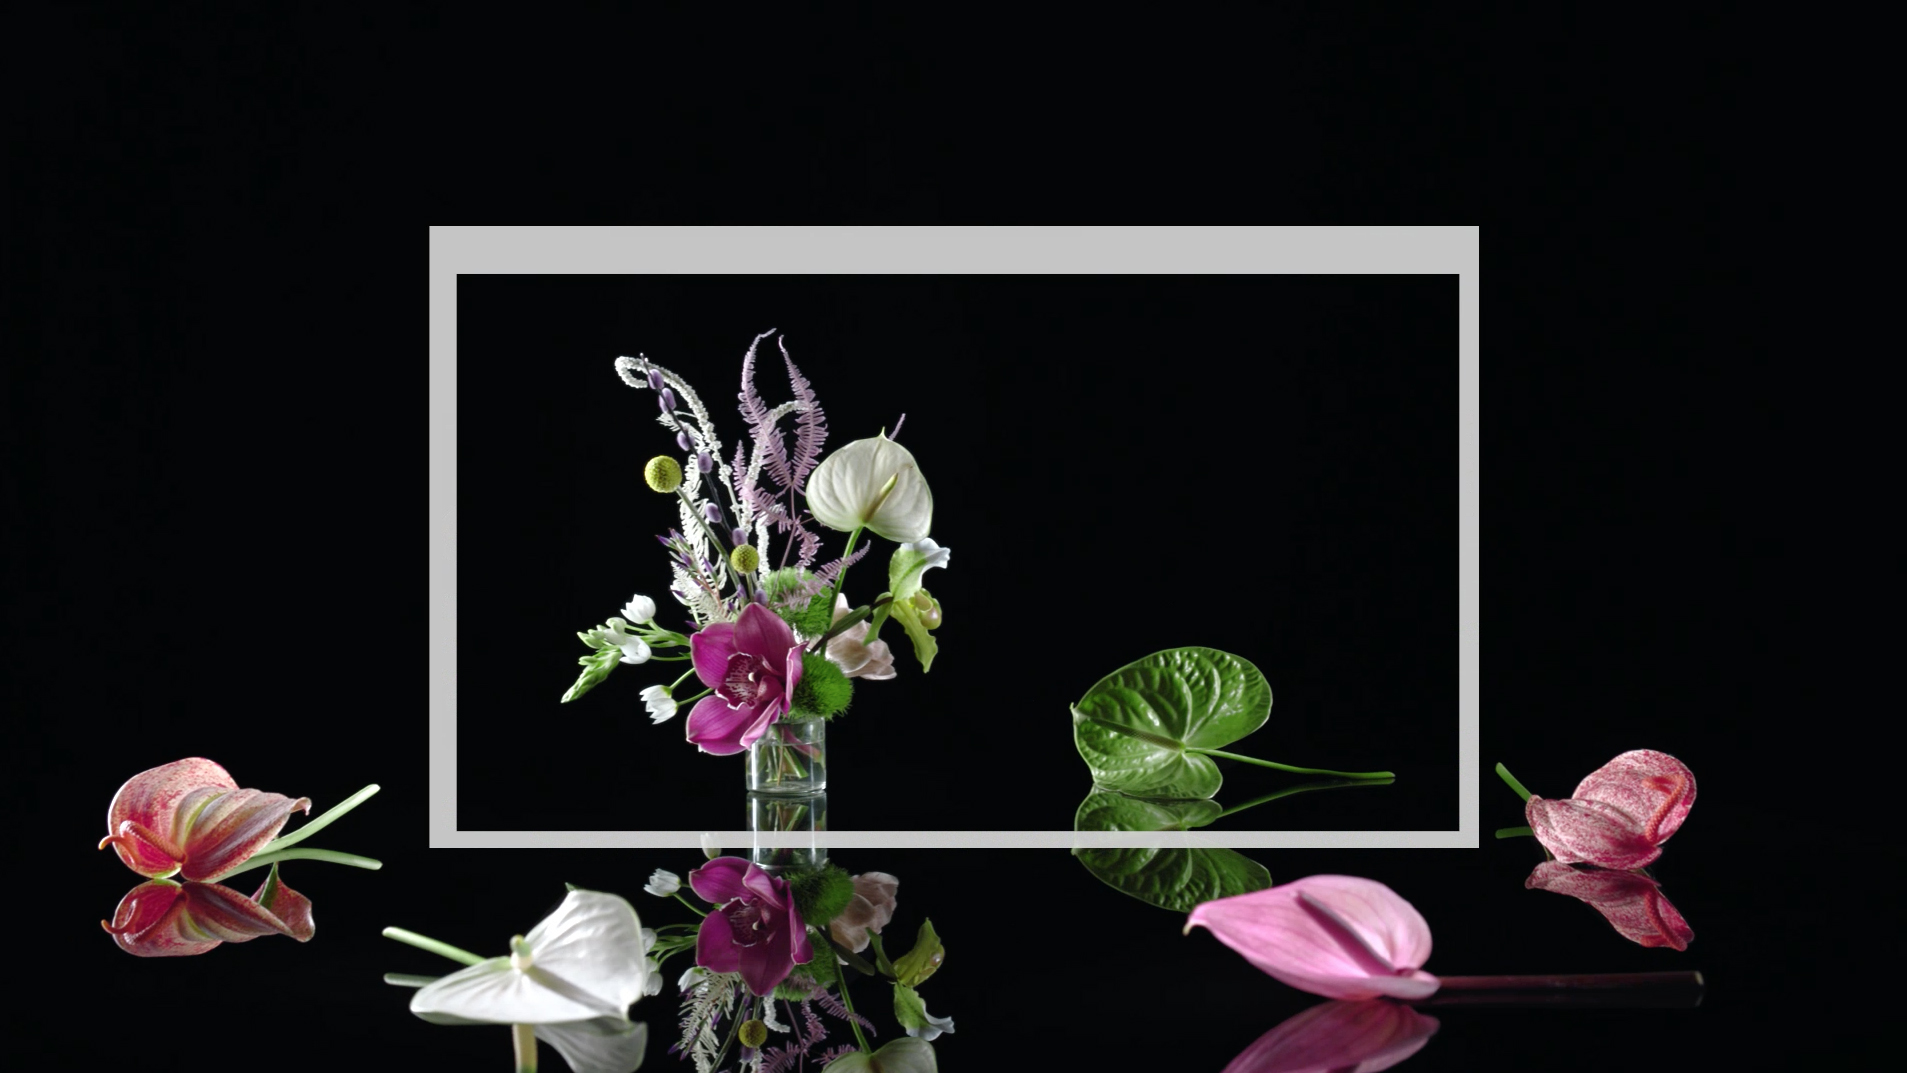 Florist15 T01 Squarespace LernetAndSander Hornet